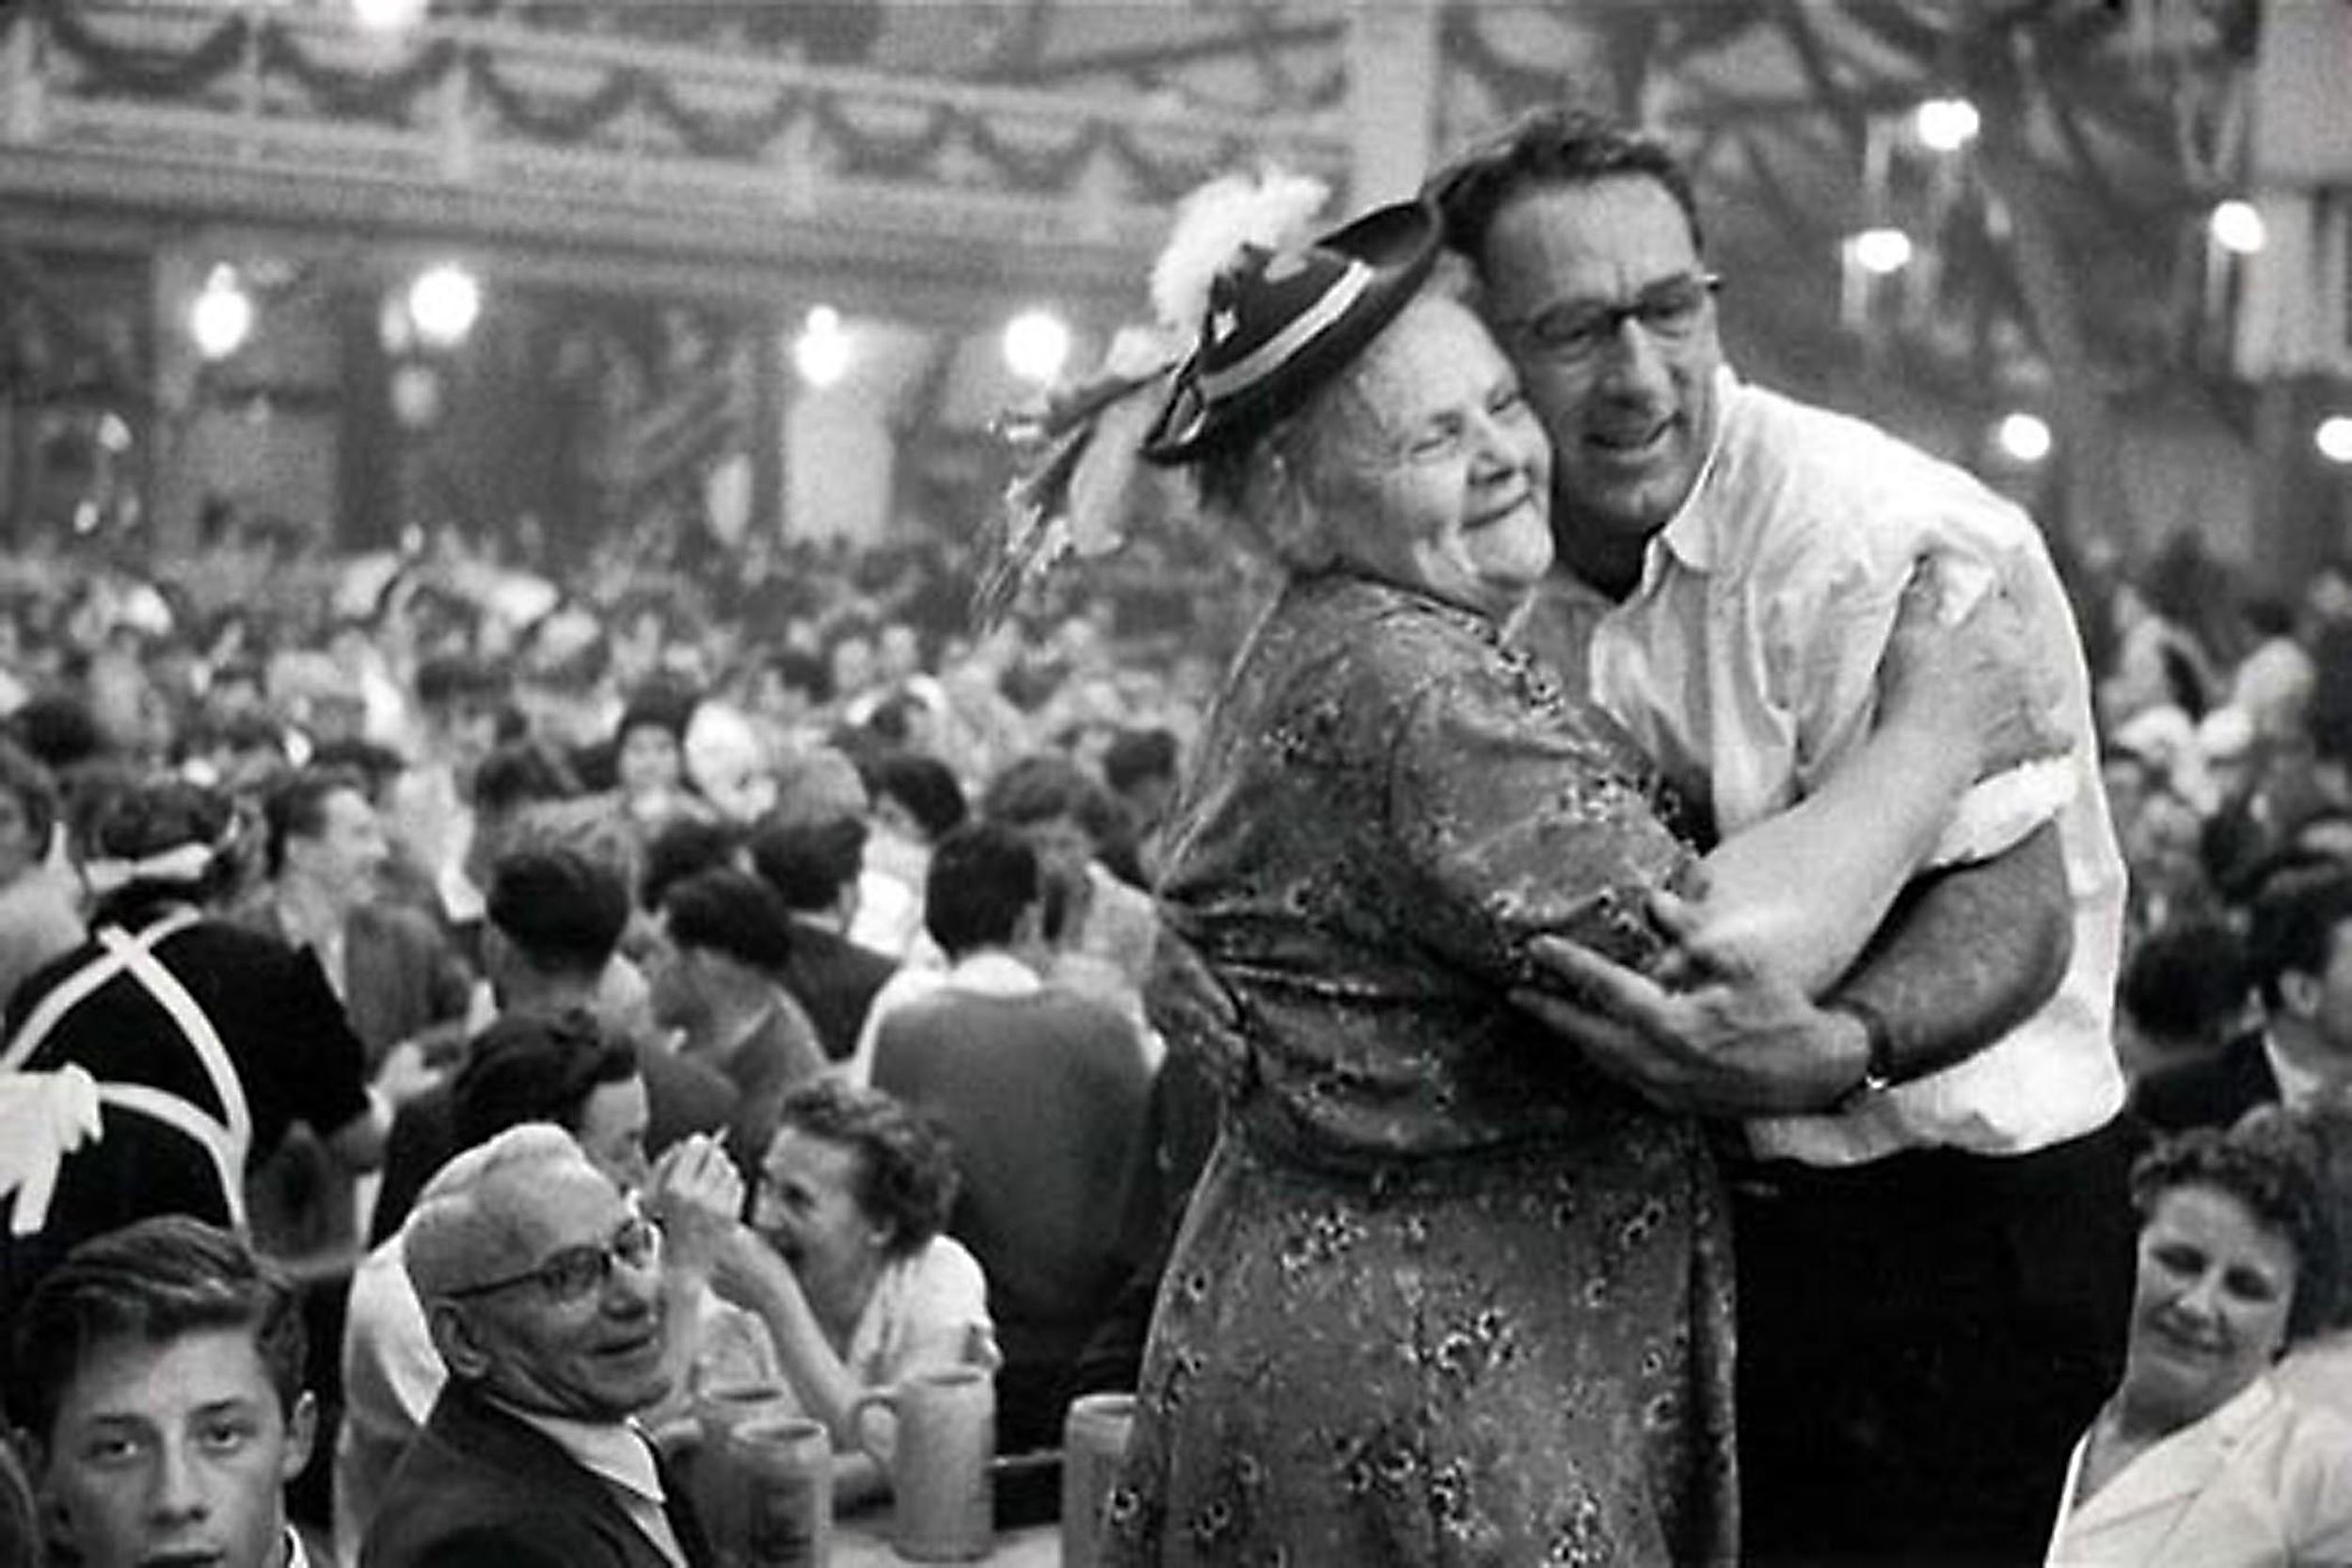 HANNON_hugging_at_octoberfest_(munich)_1957_p11x14_high.jpg